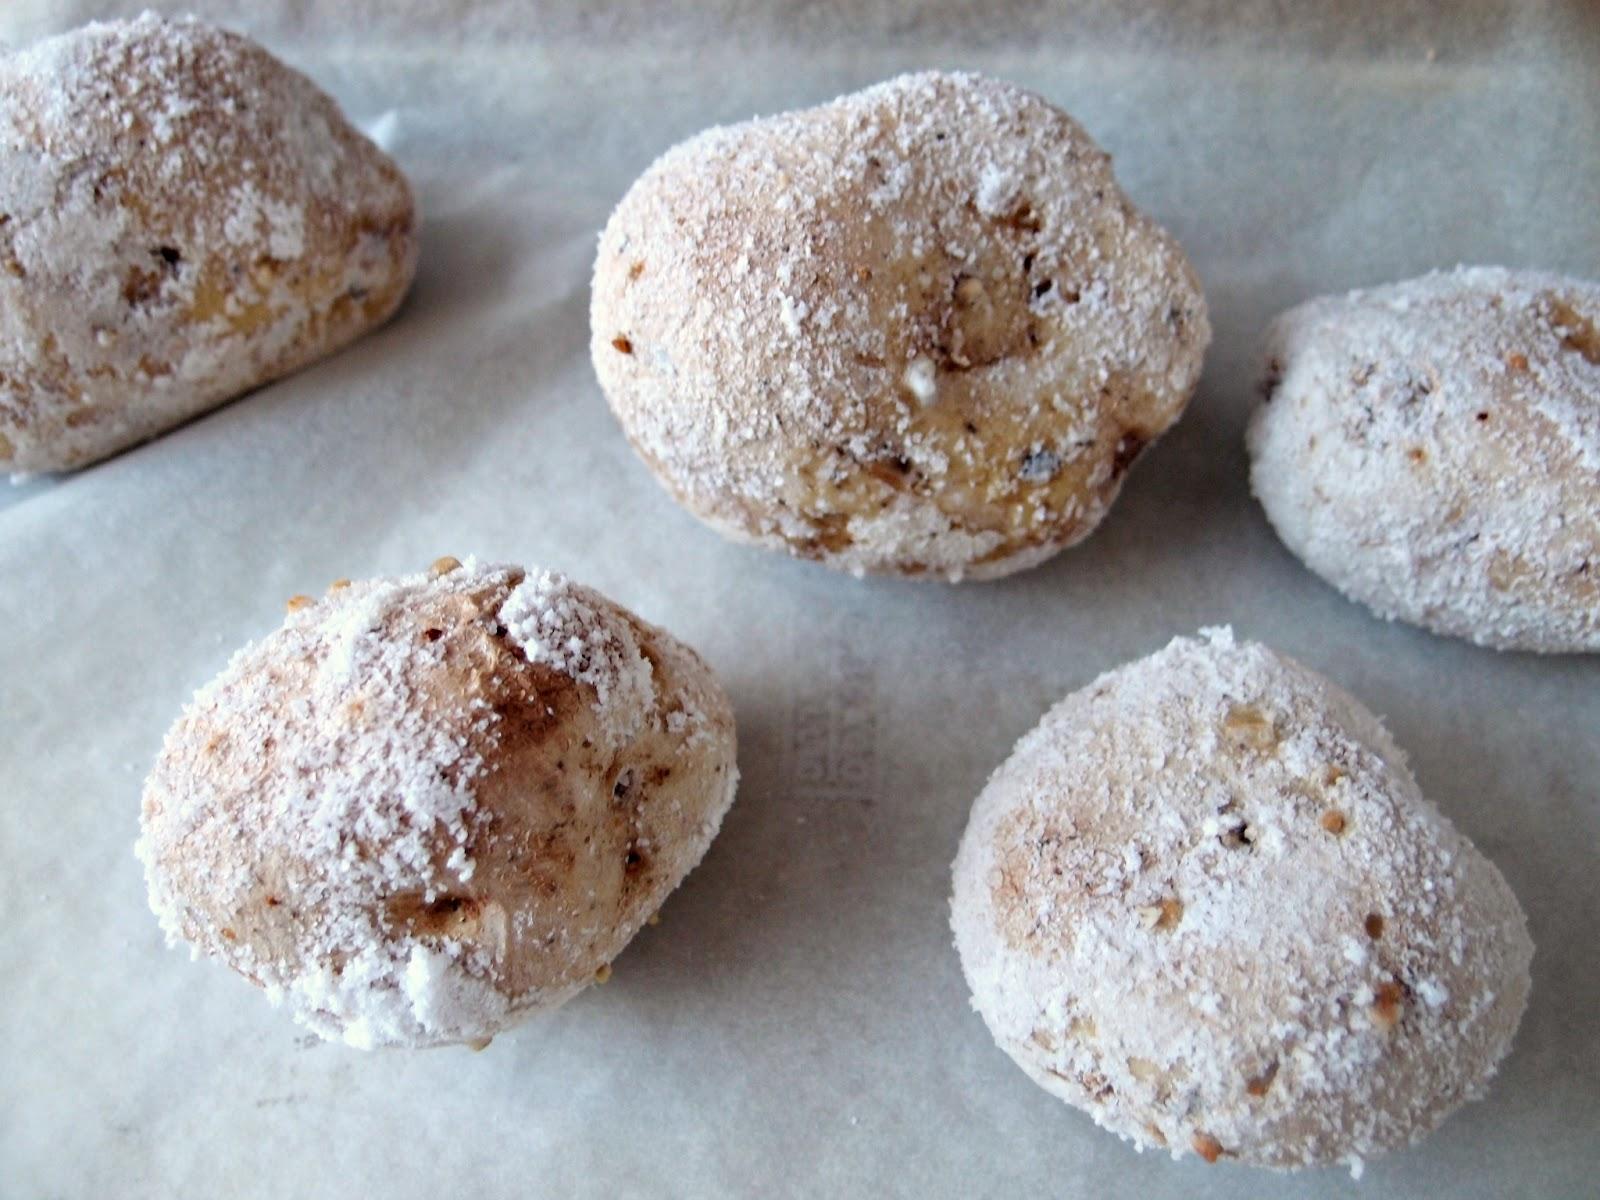 Milk and Honey: Salt Baked Potatoes With Guacamole